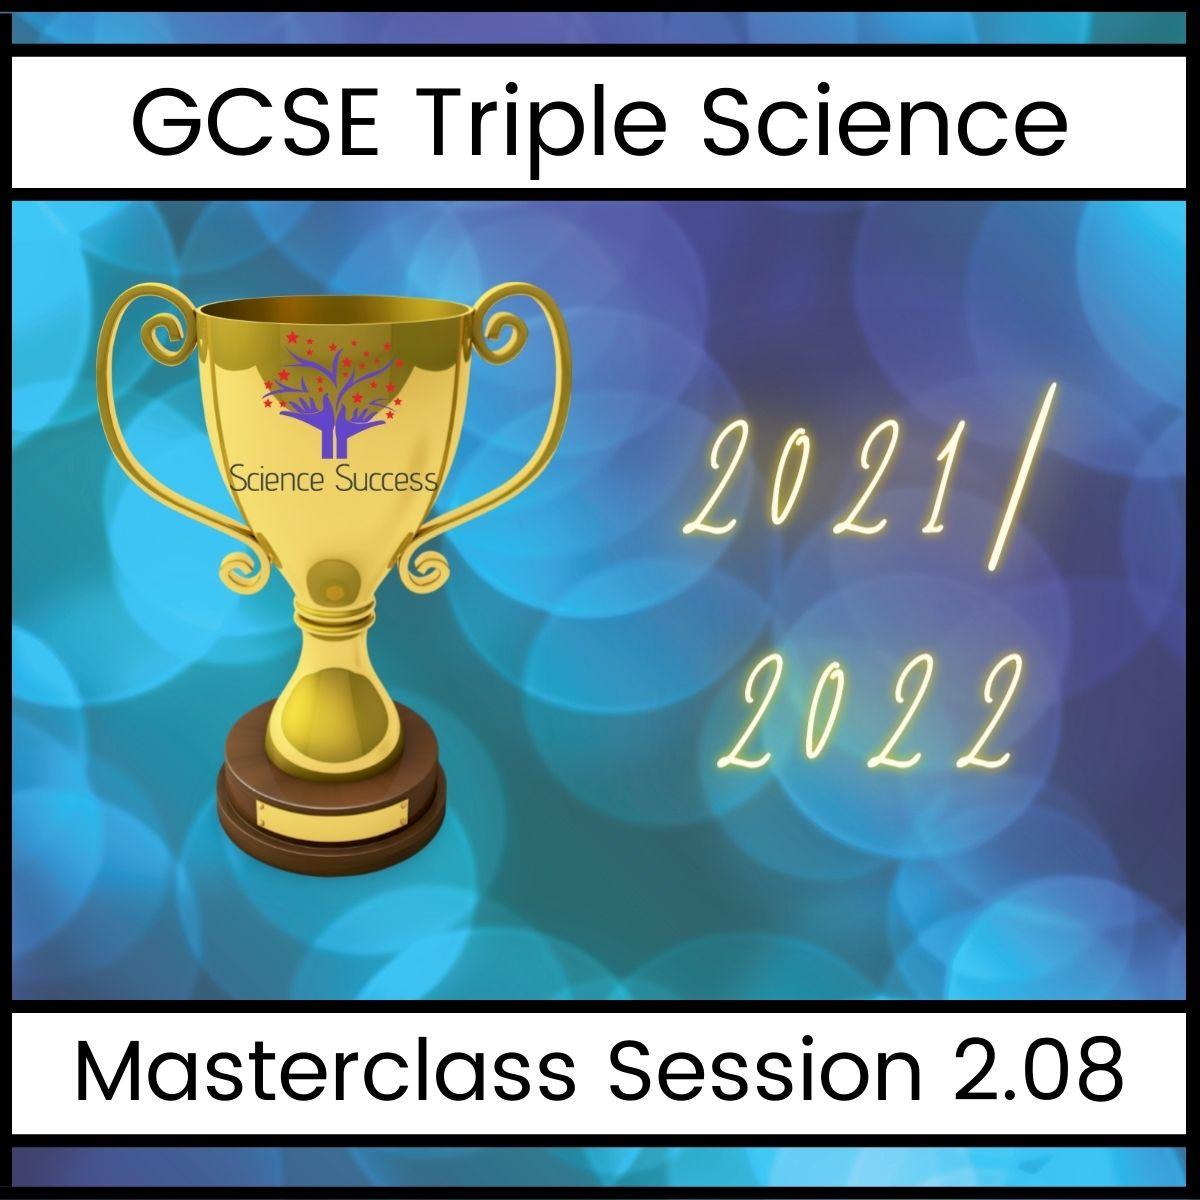 2.08 T 202122